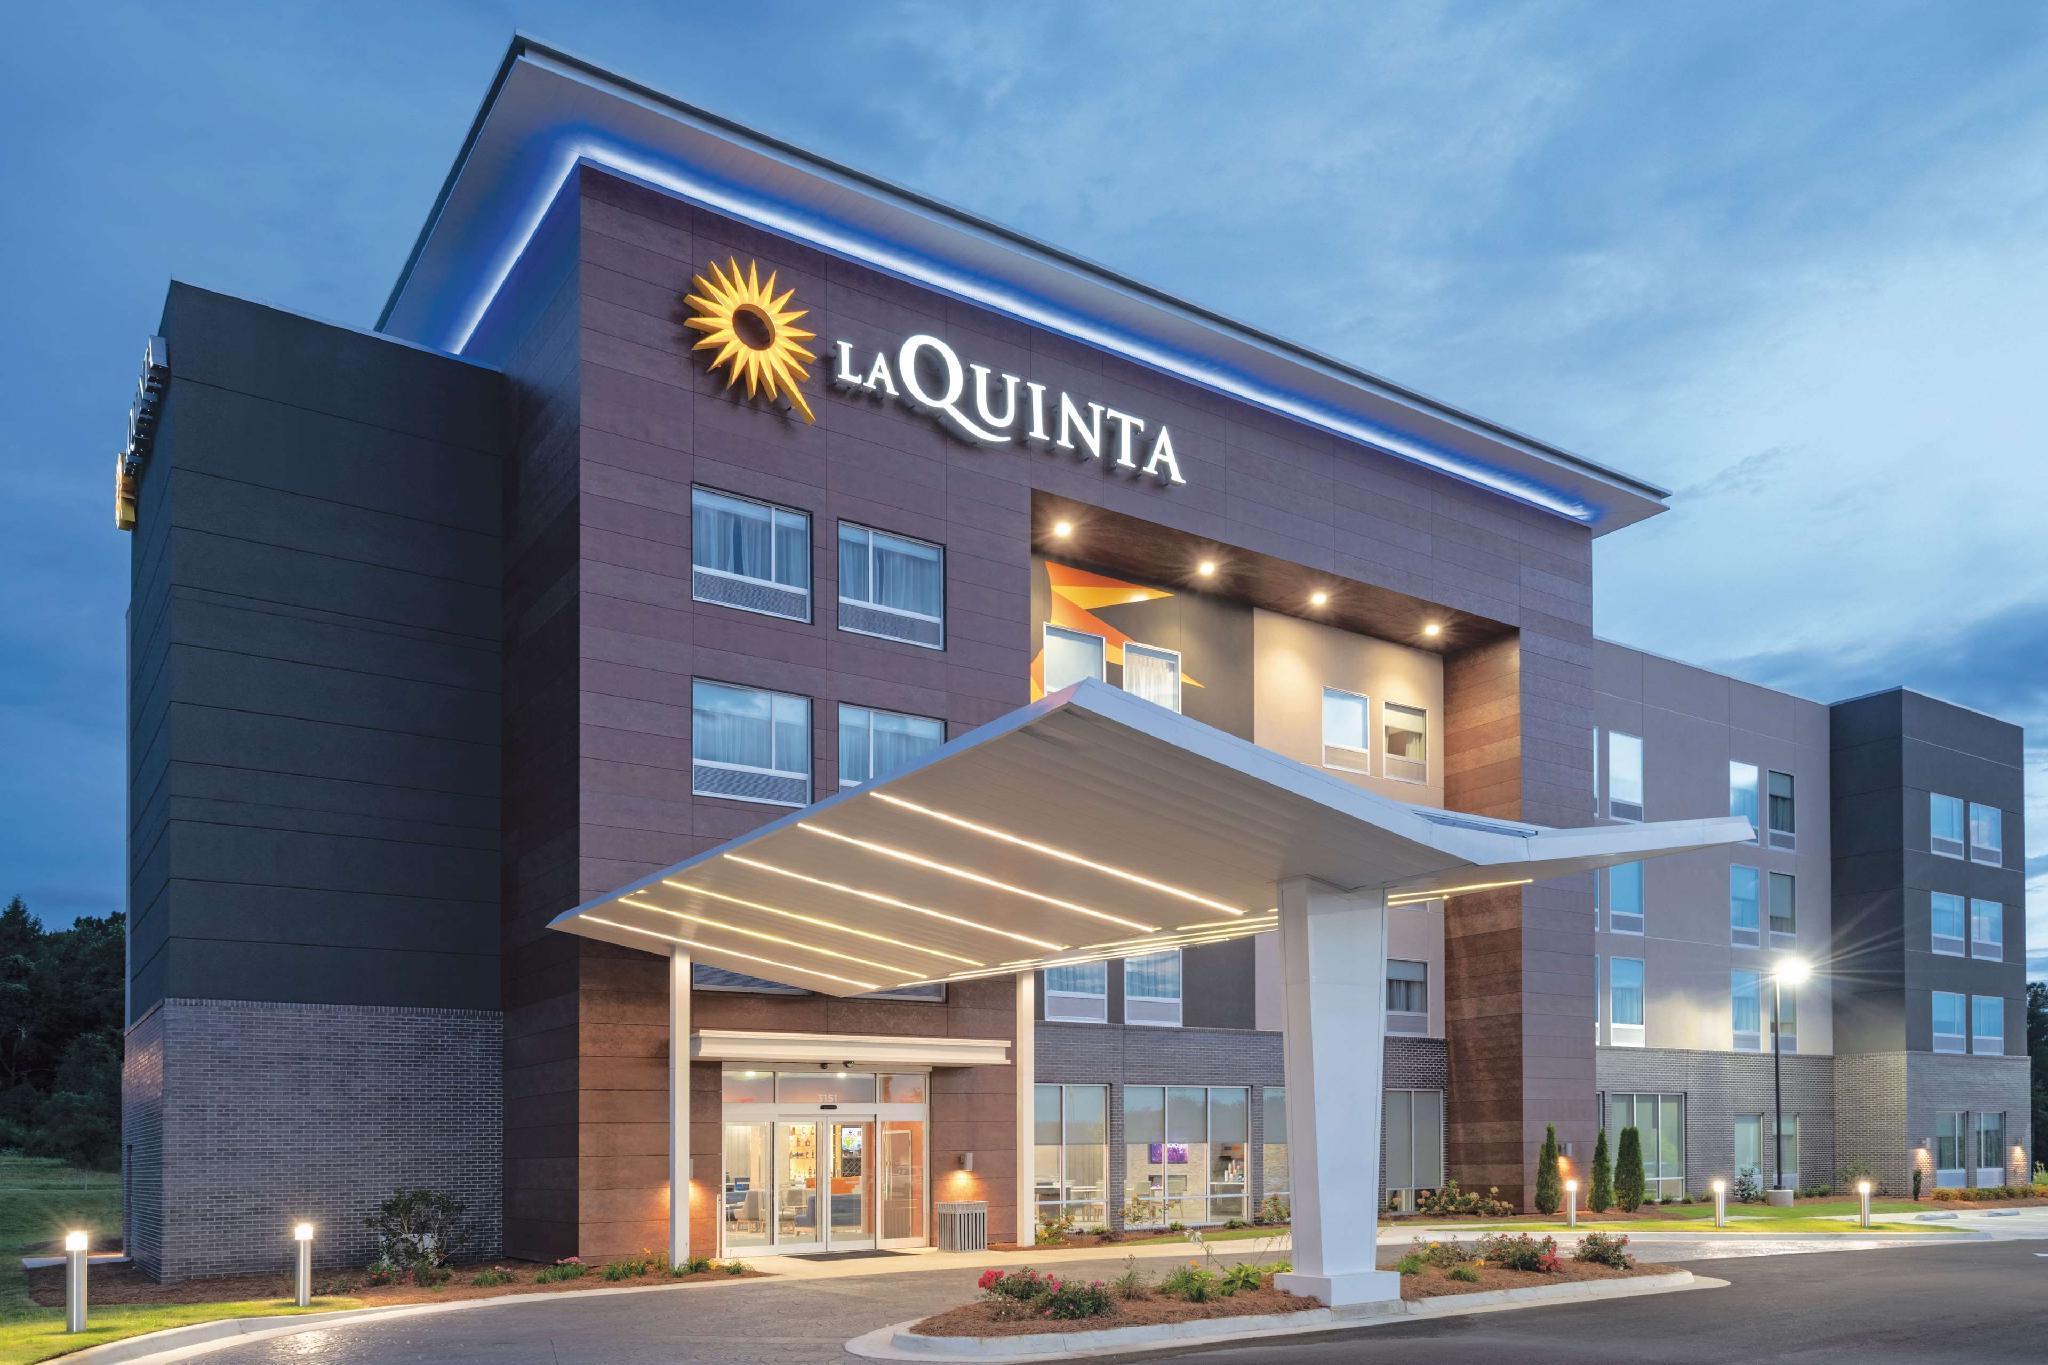 La Quinta Inn And Suites By Wyndham Opelika Auburn